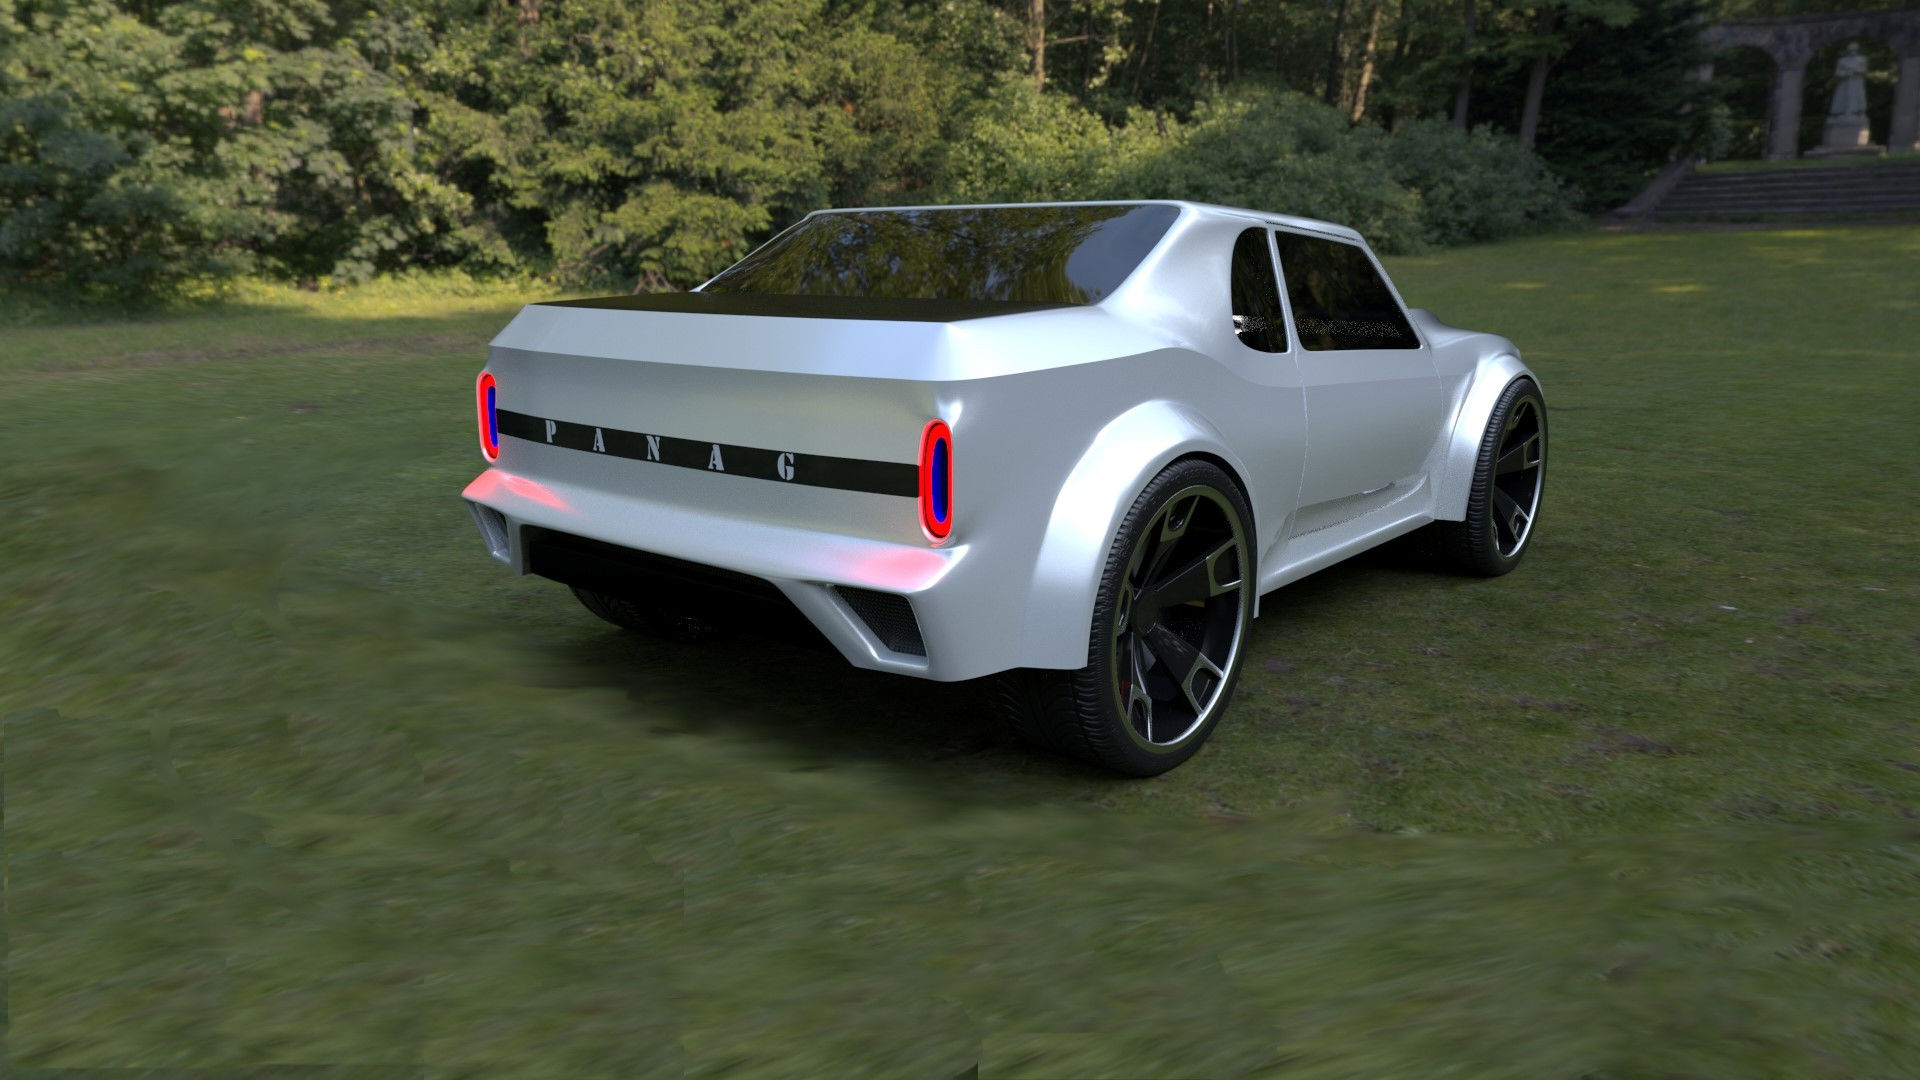 Rodio2p-3500-3500